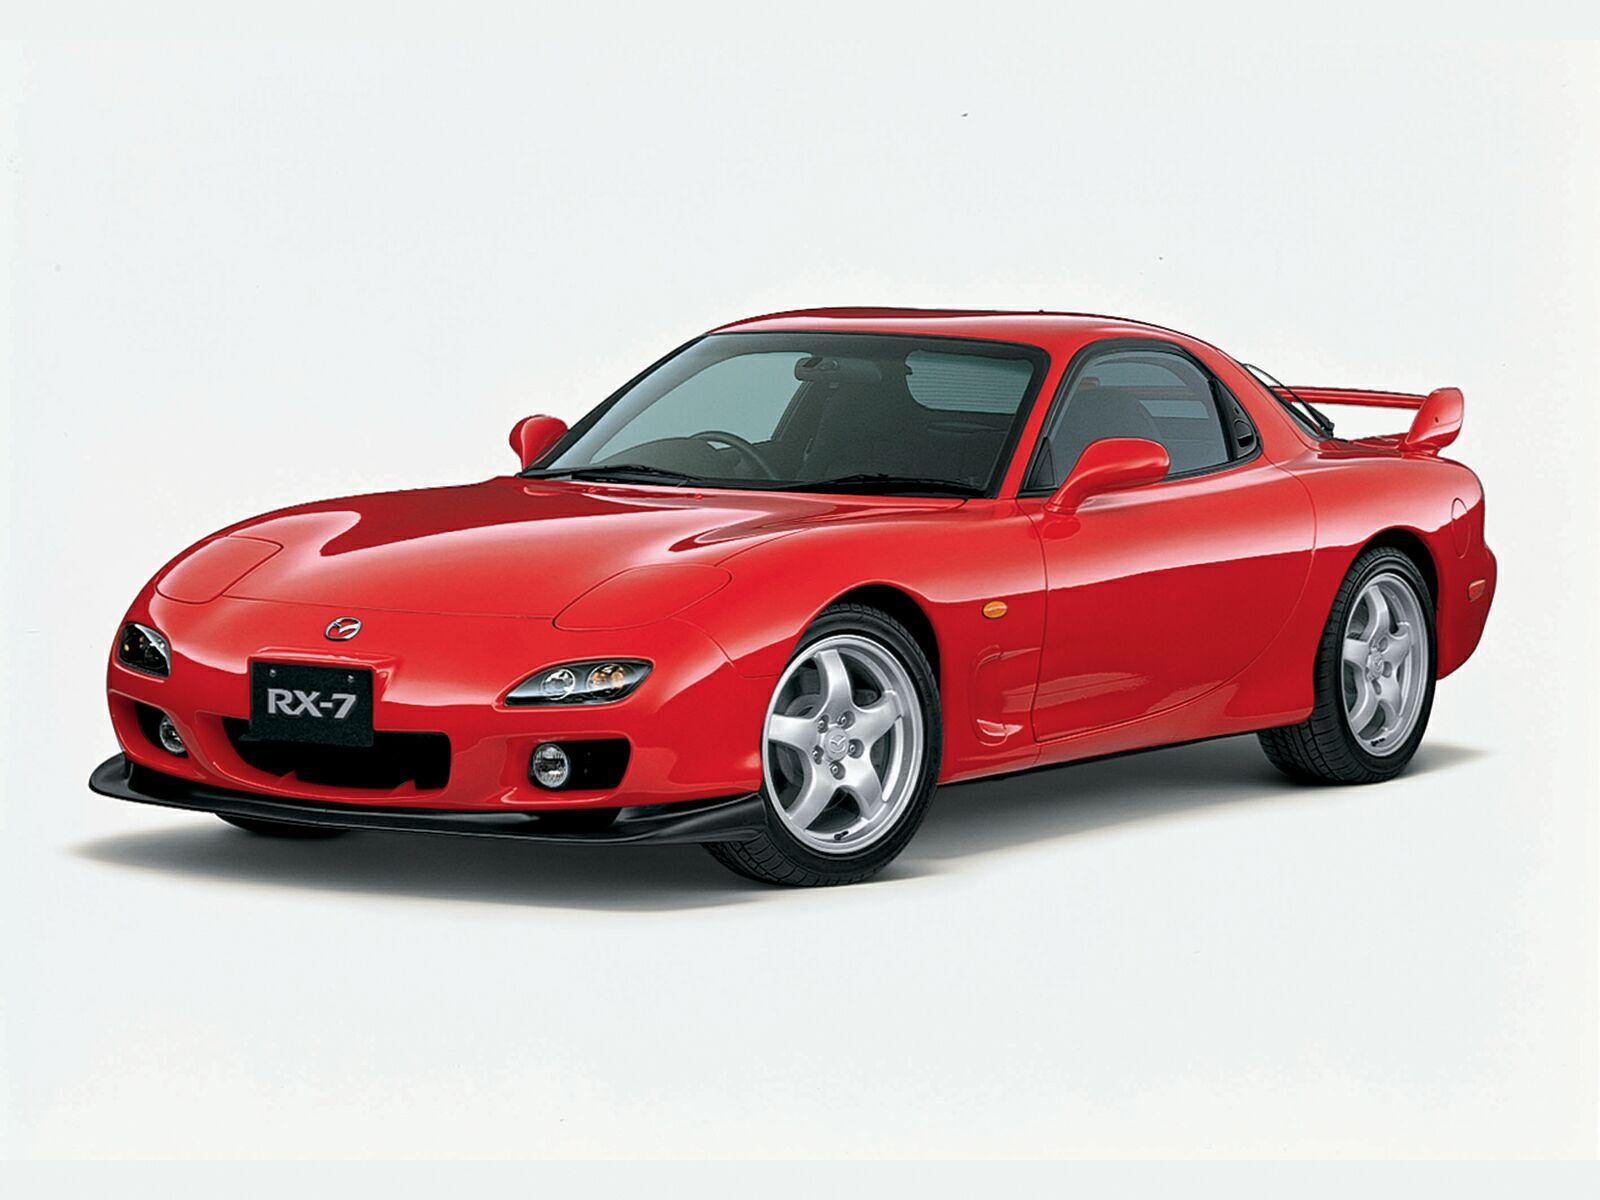 http://3.bp.blogspot.com/-QHmyXJIwXKE/Tyg2z_fVESI/AAAAAAAAB5s/uUzD0xonWZk/s1600/Mazda-RX7-8-W2083TTP82-1600x12004.jpg